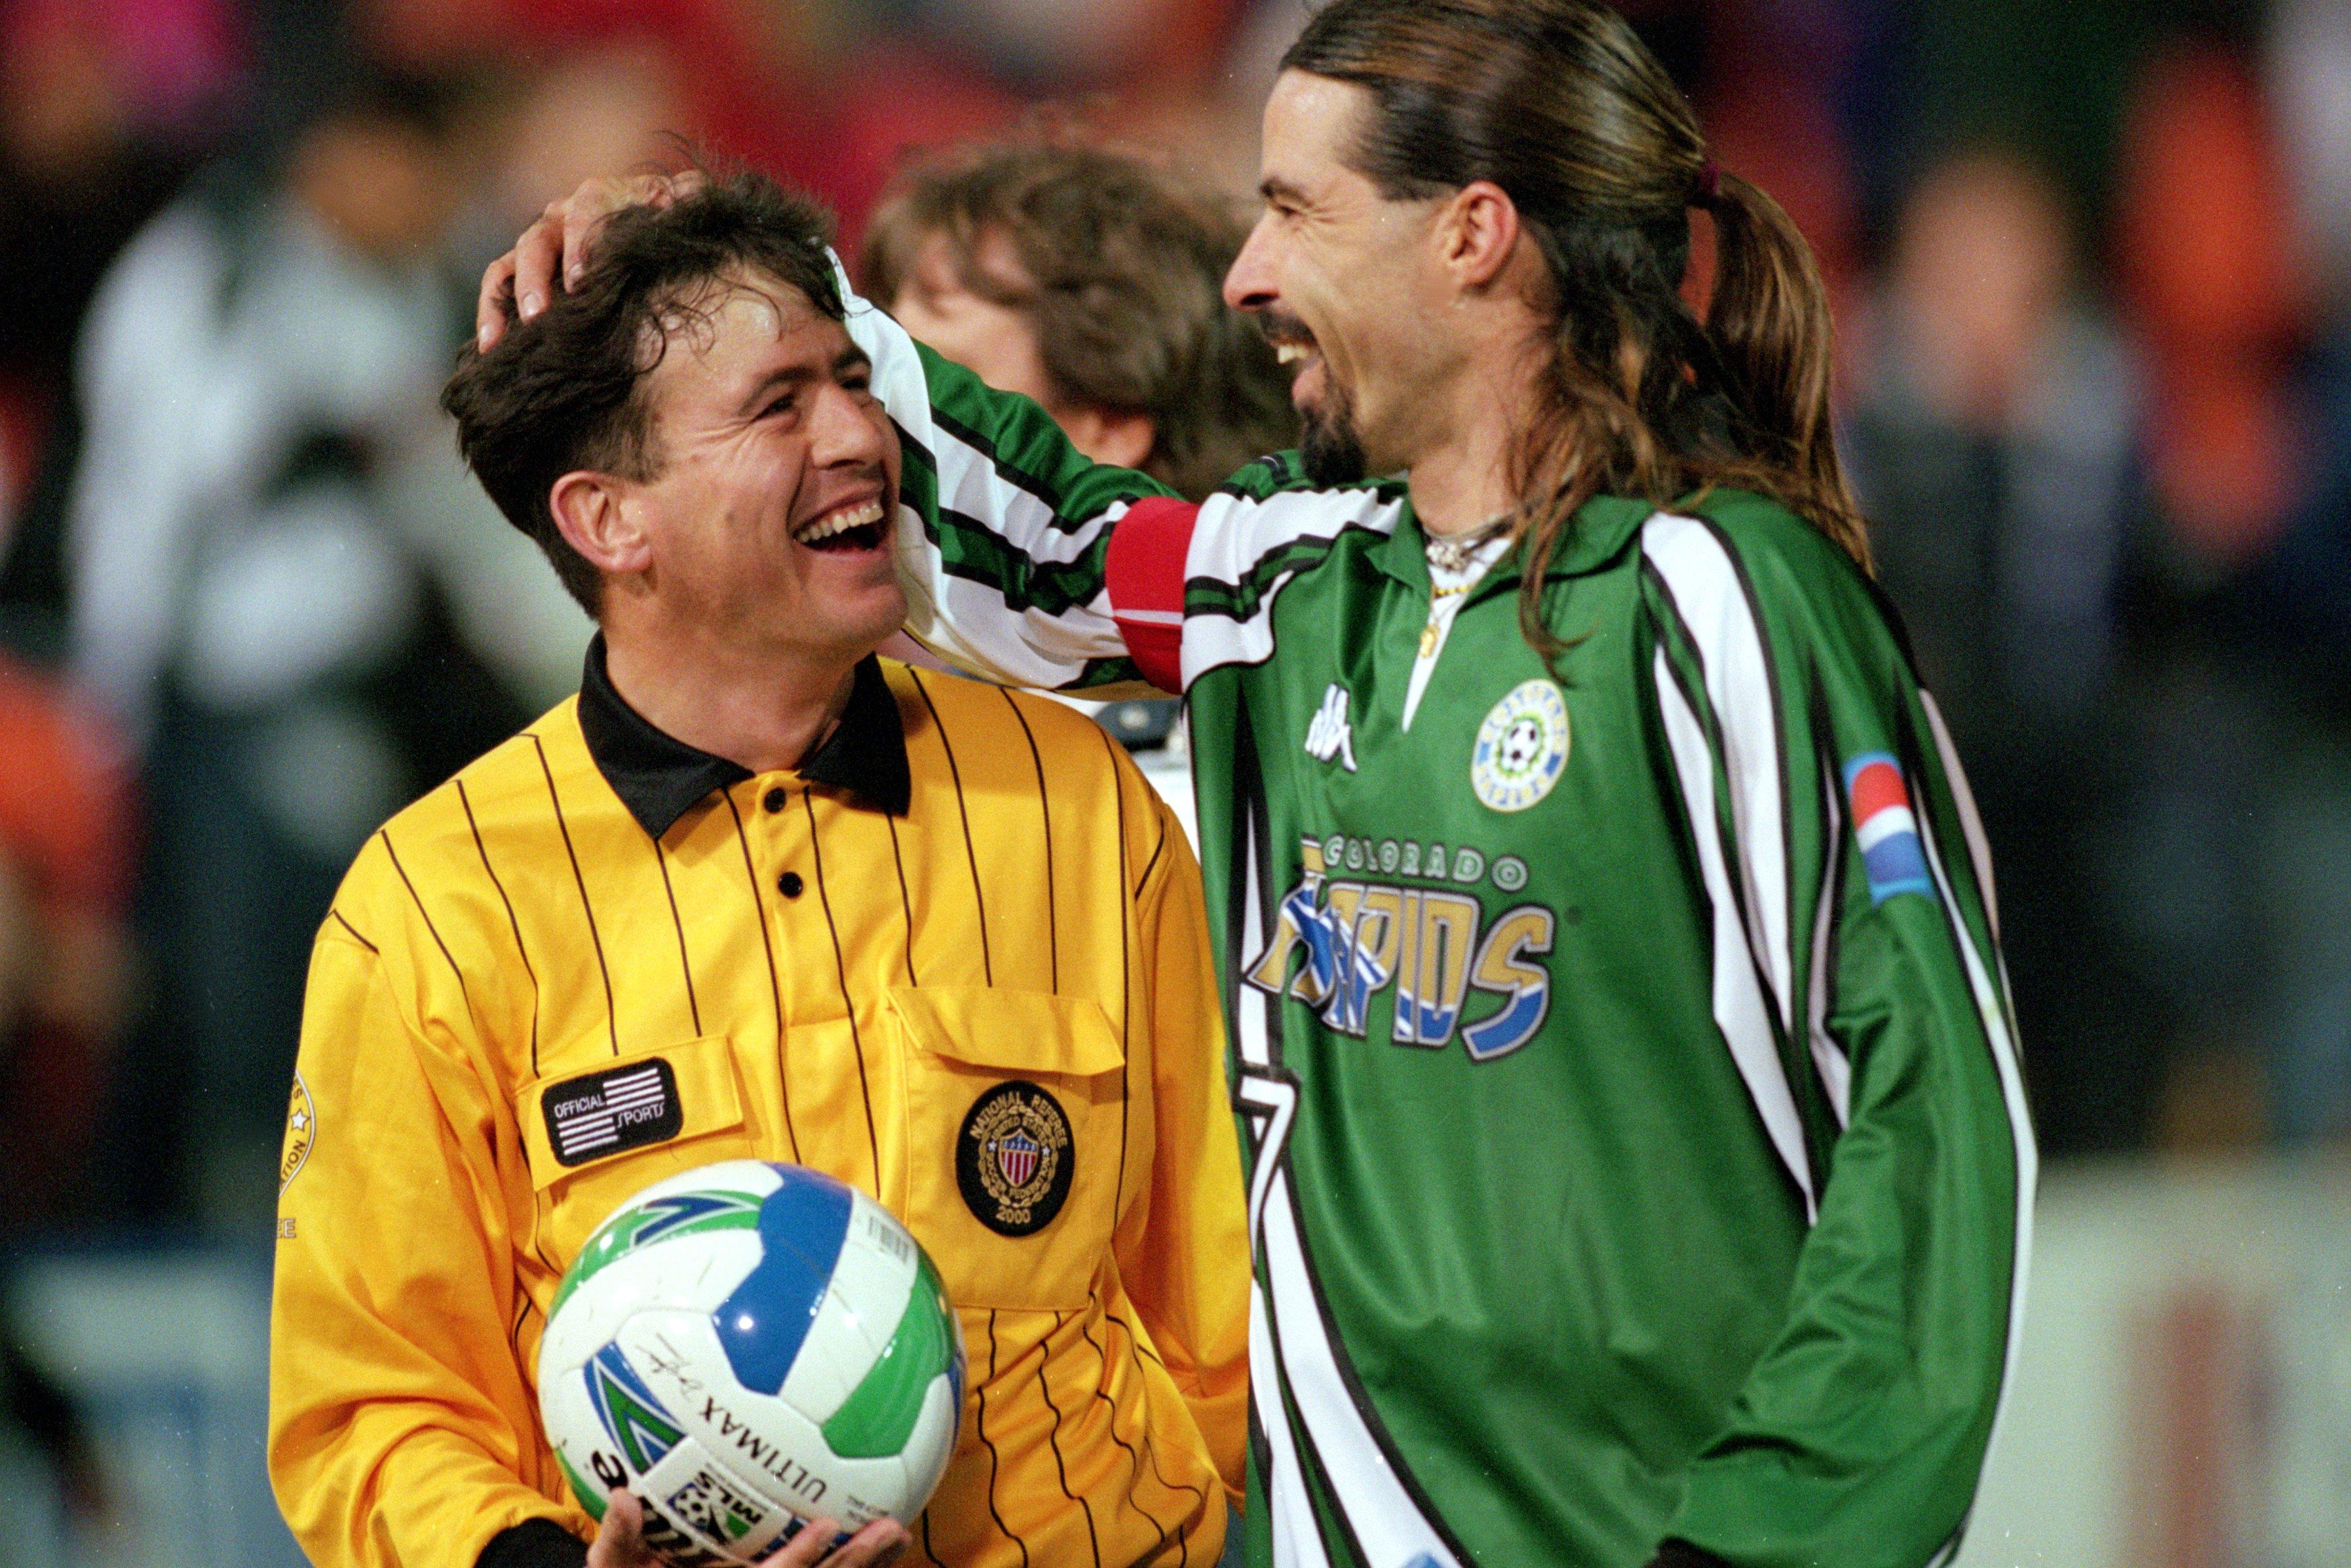 Referee Noel Kenny/Marcelo Balboa #17